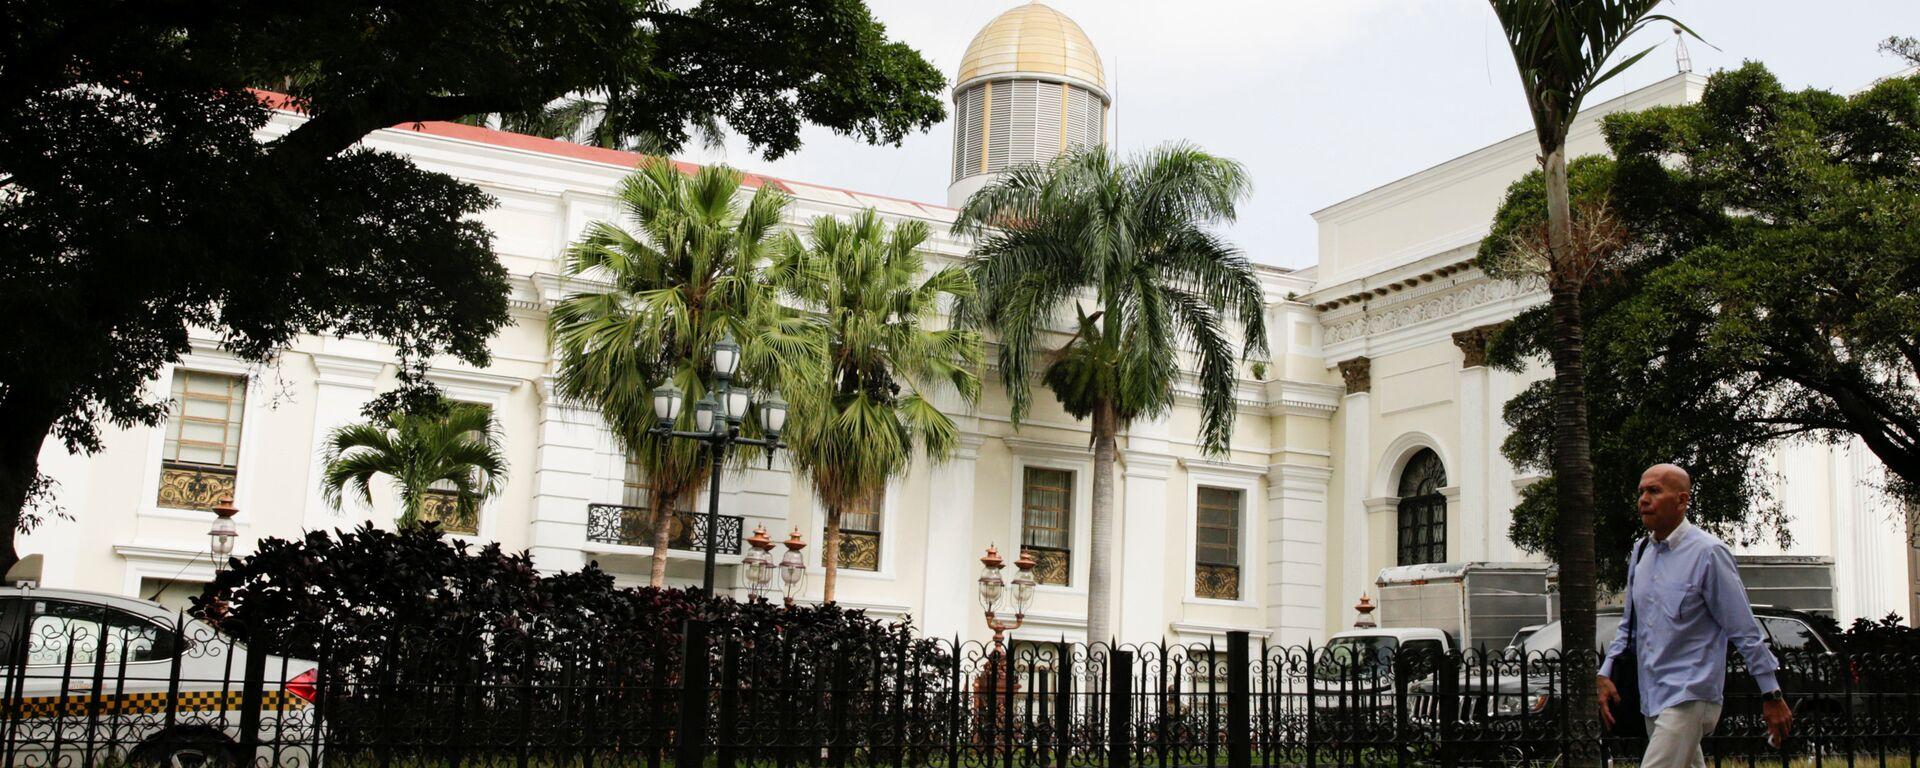 A man walks past the building of the National Assembly in Caracas, Venezuela - Sputnik Mundo, 1920, 17.08.2021